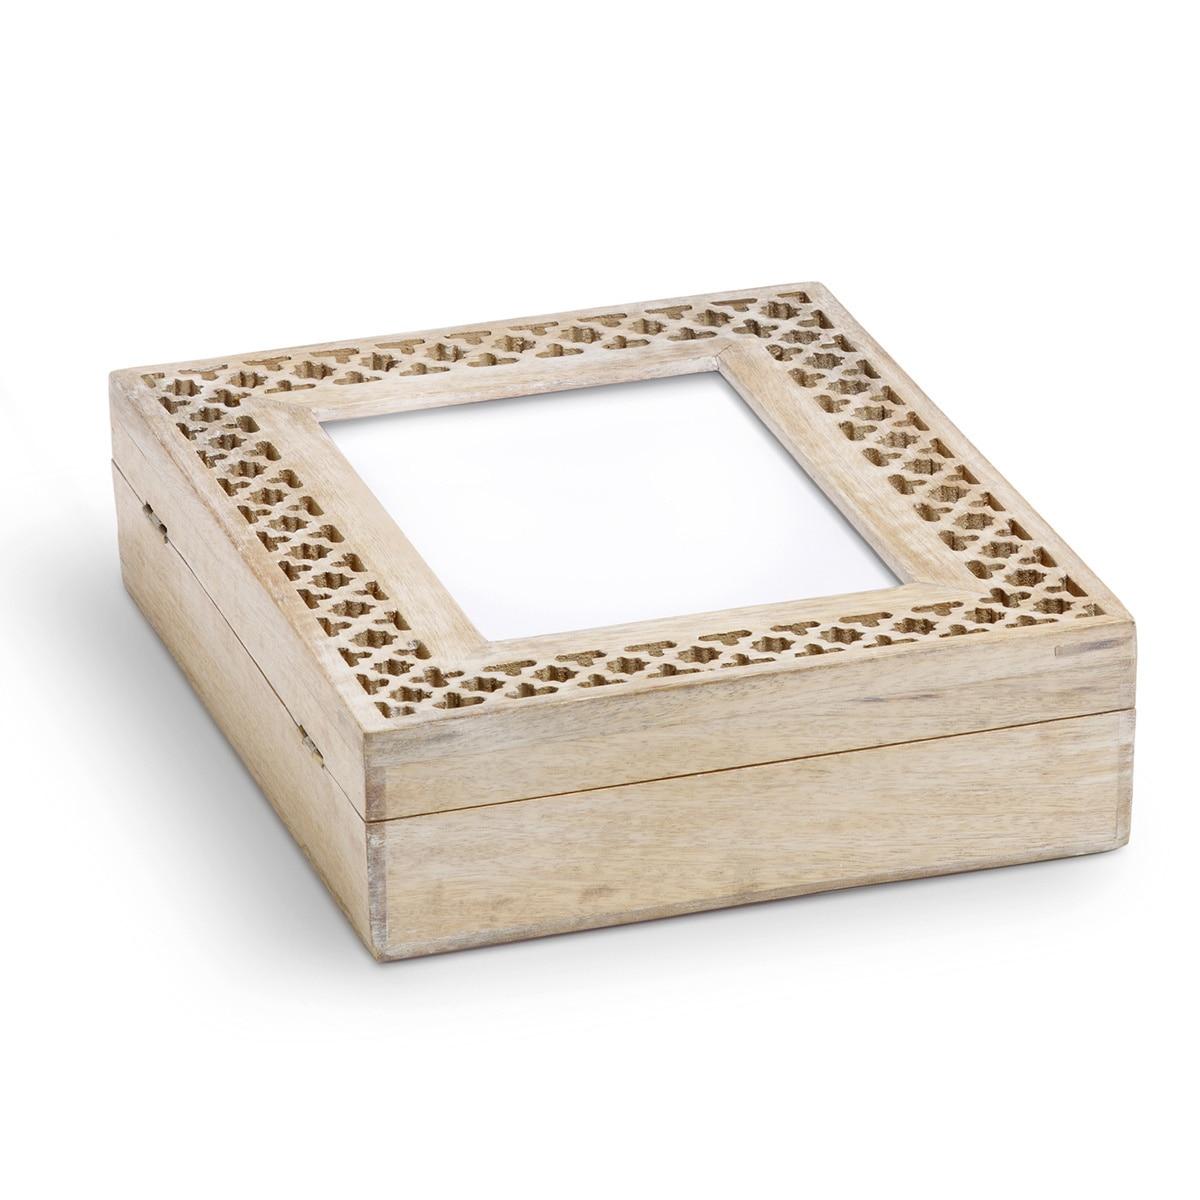 Mela Artisans Hand-carved Trellis Mango Wood Decorative Photo Frame Box at Sears.com